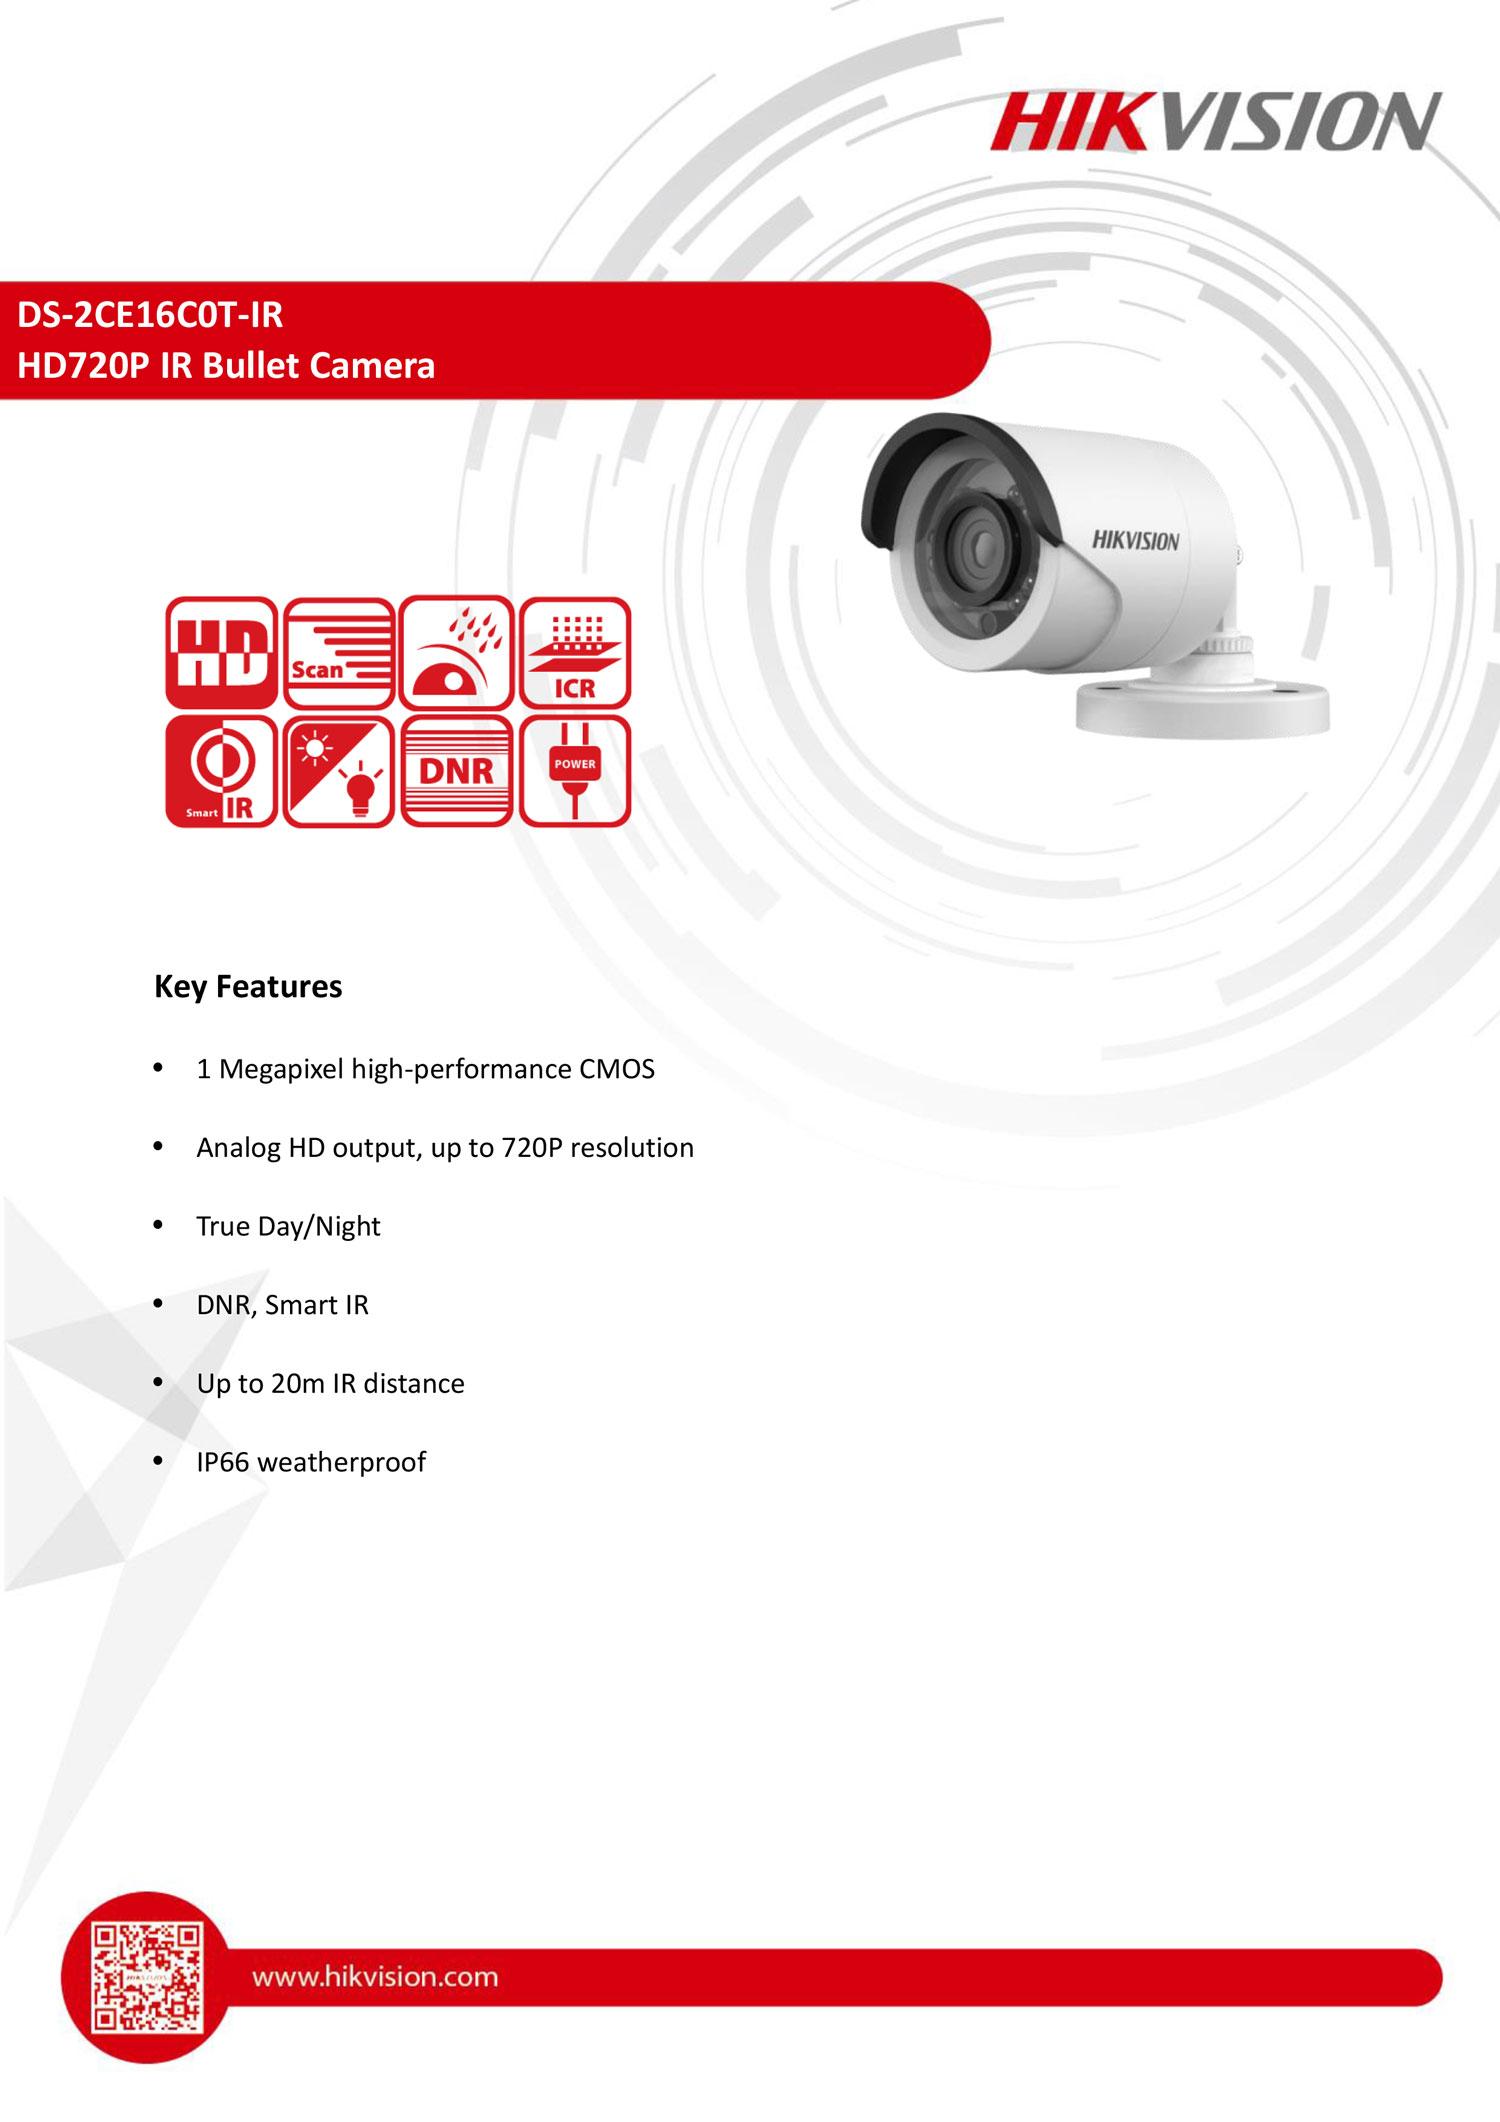 CCTV DS-CE16C0T-IR กล้องวงจรปิด Hikvision HDTVI 1MP